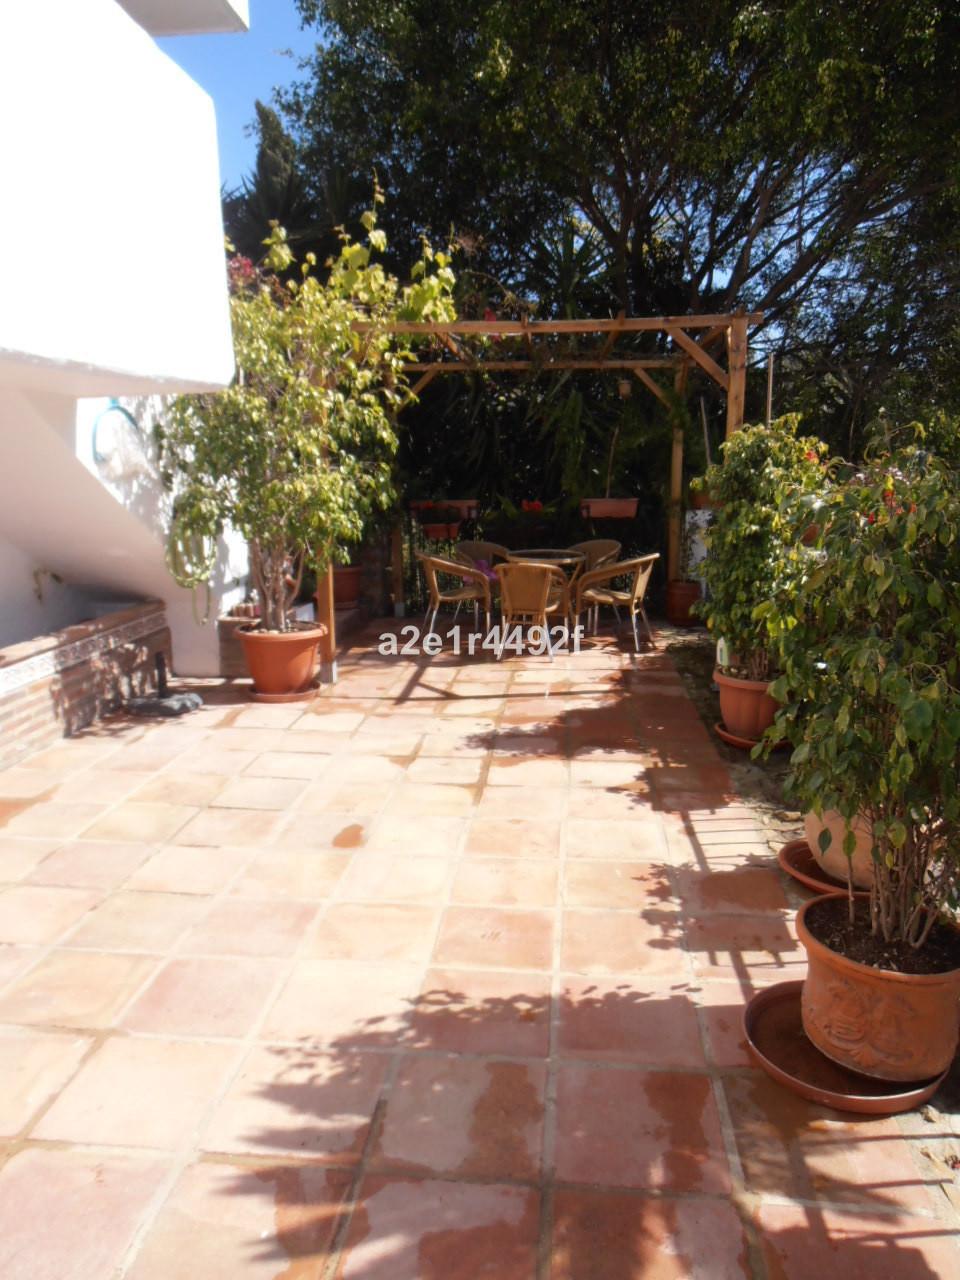 Townhouse, Marbella, Costa del Sol. 4 Bedrooms, 4 Bathrooms, Built 200 m², Terrace 30 m². Divided ov,Spain